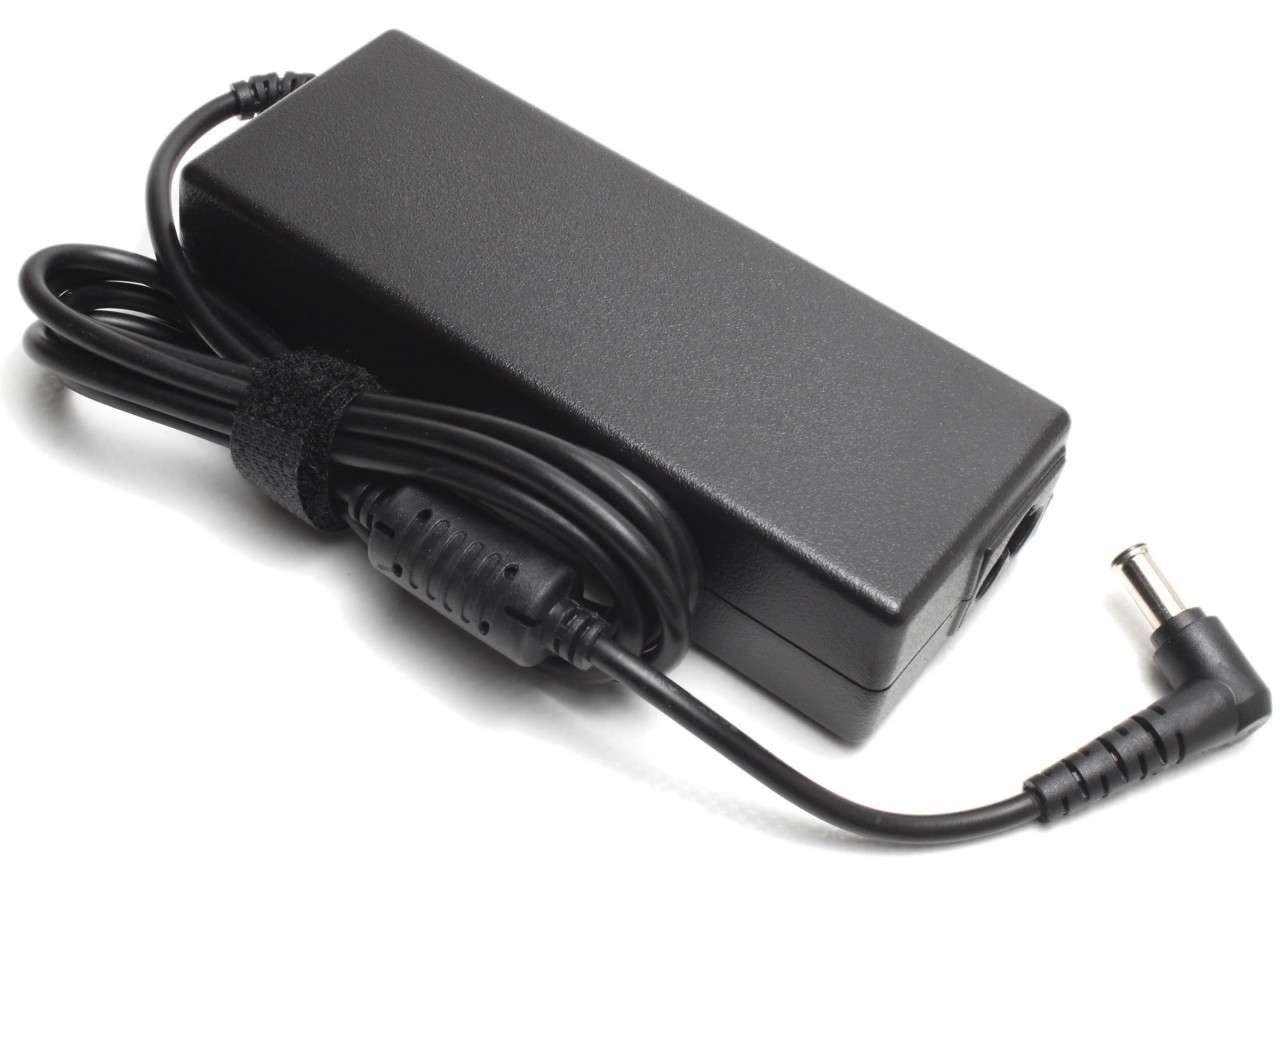 Incarcator Sony Vaio VPCEA4AFX Replacement imagine powerlaptop.ro 2021